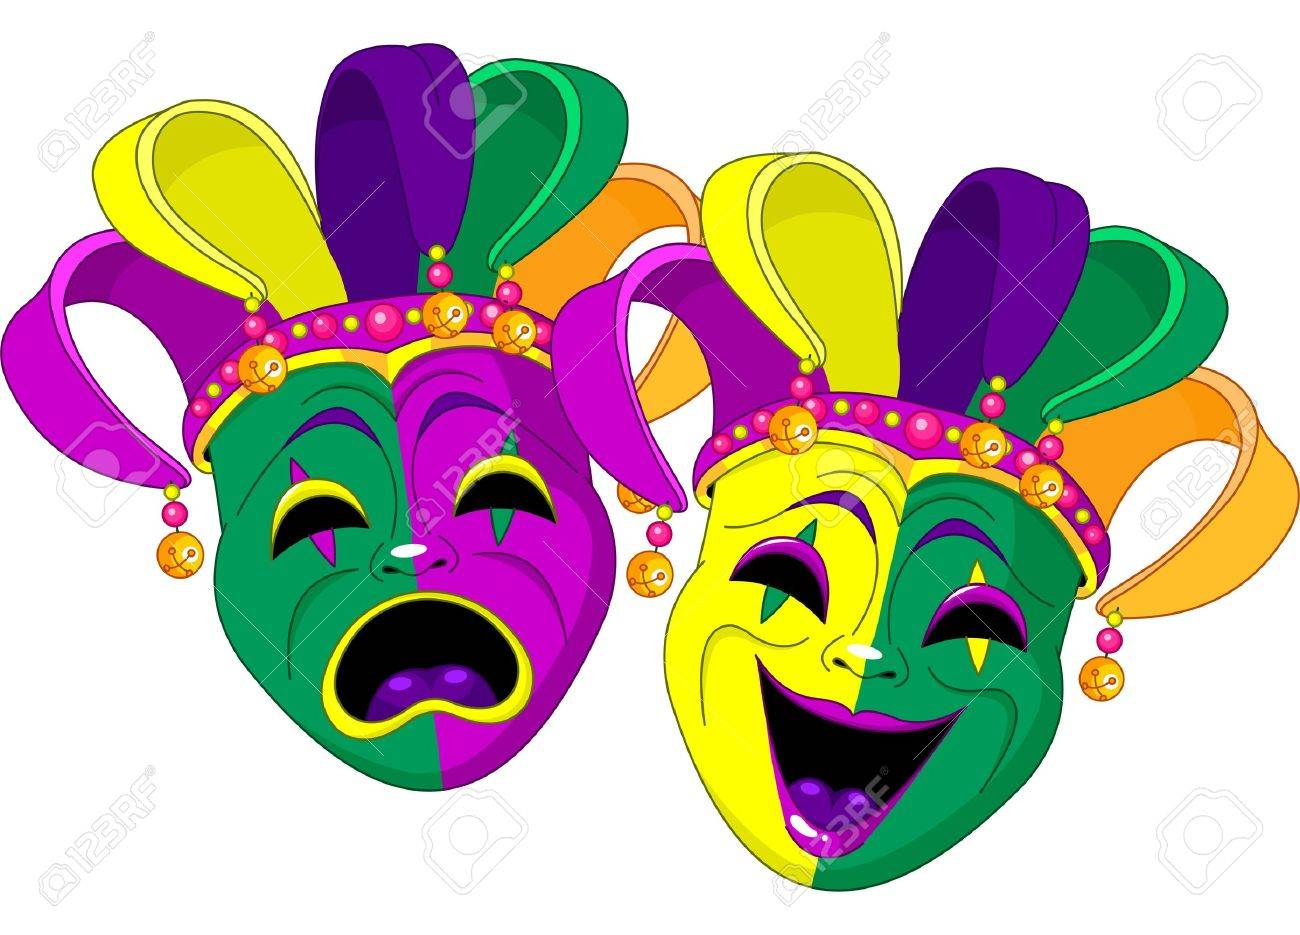 mardi gras comedy and tragedy masks royalty free cliparts vectors rh 123rf com